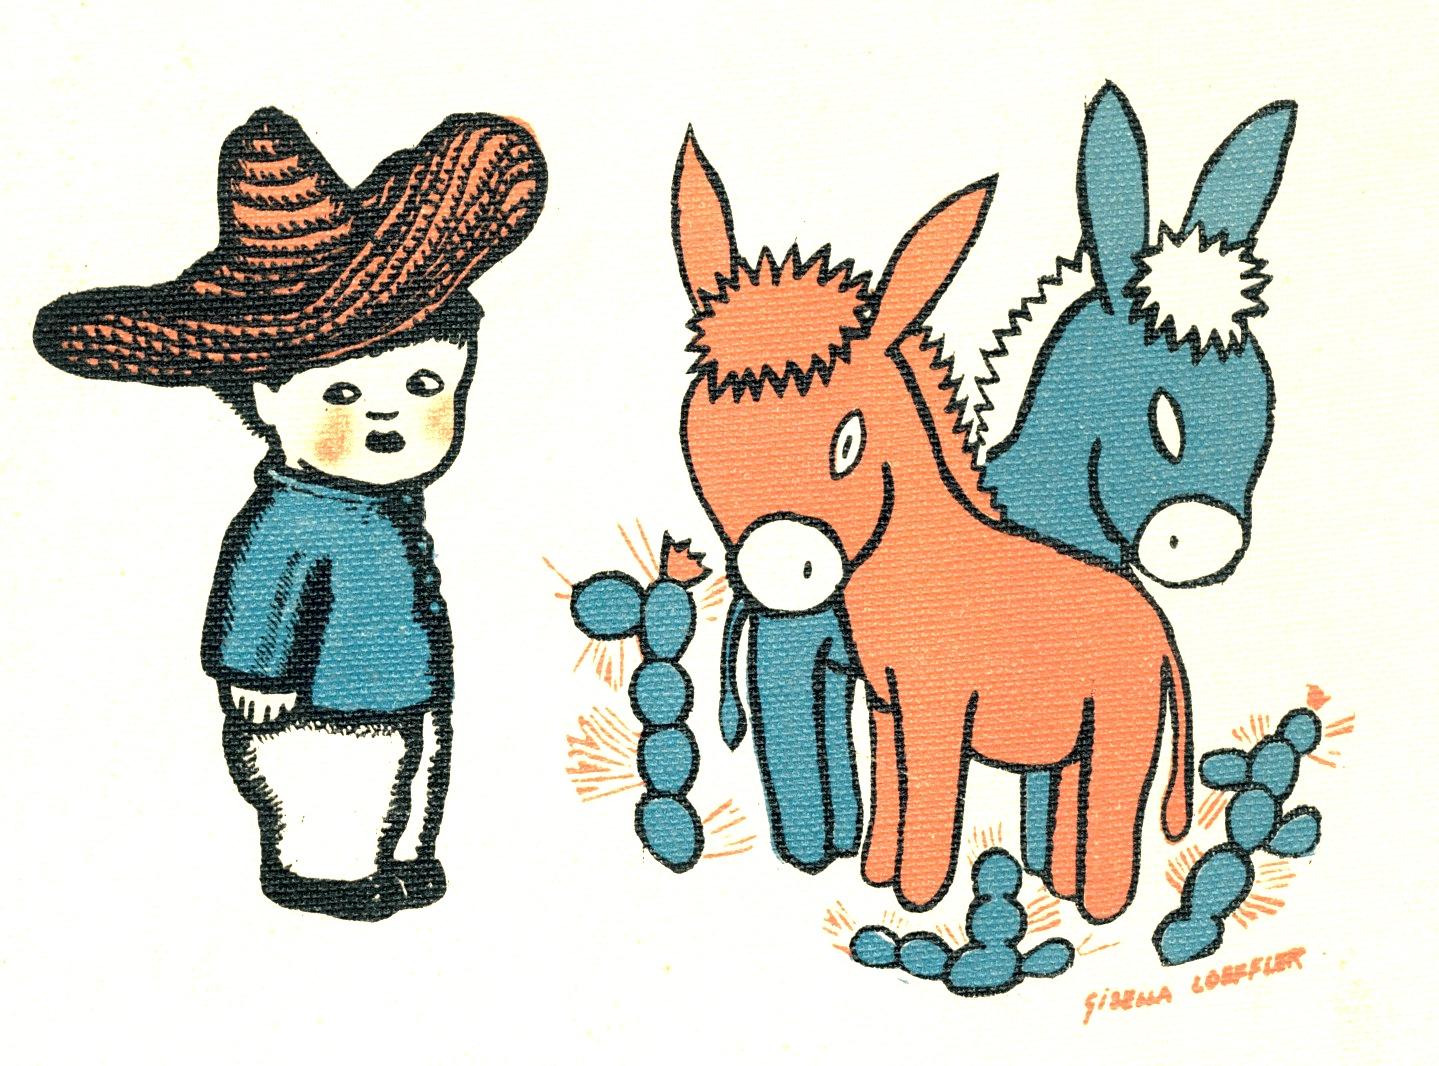 http://2.bp.blogspot.com/-e89YqC5DTWo/U2S58lAqlKI/AAAAAAAAOSk/rJTjPix64fk/s1600/boy+and+donkey.jpg